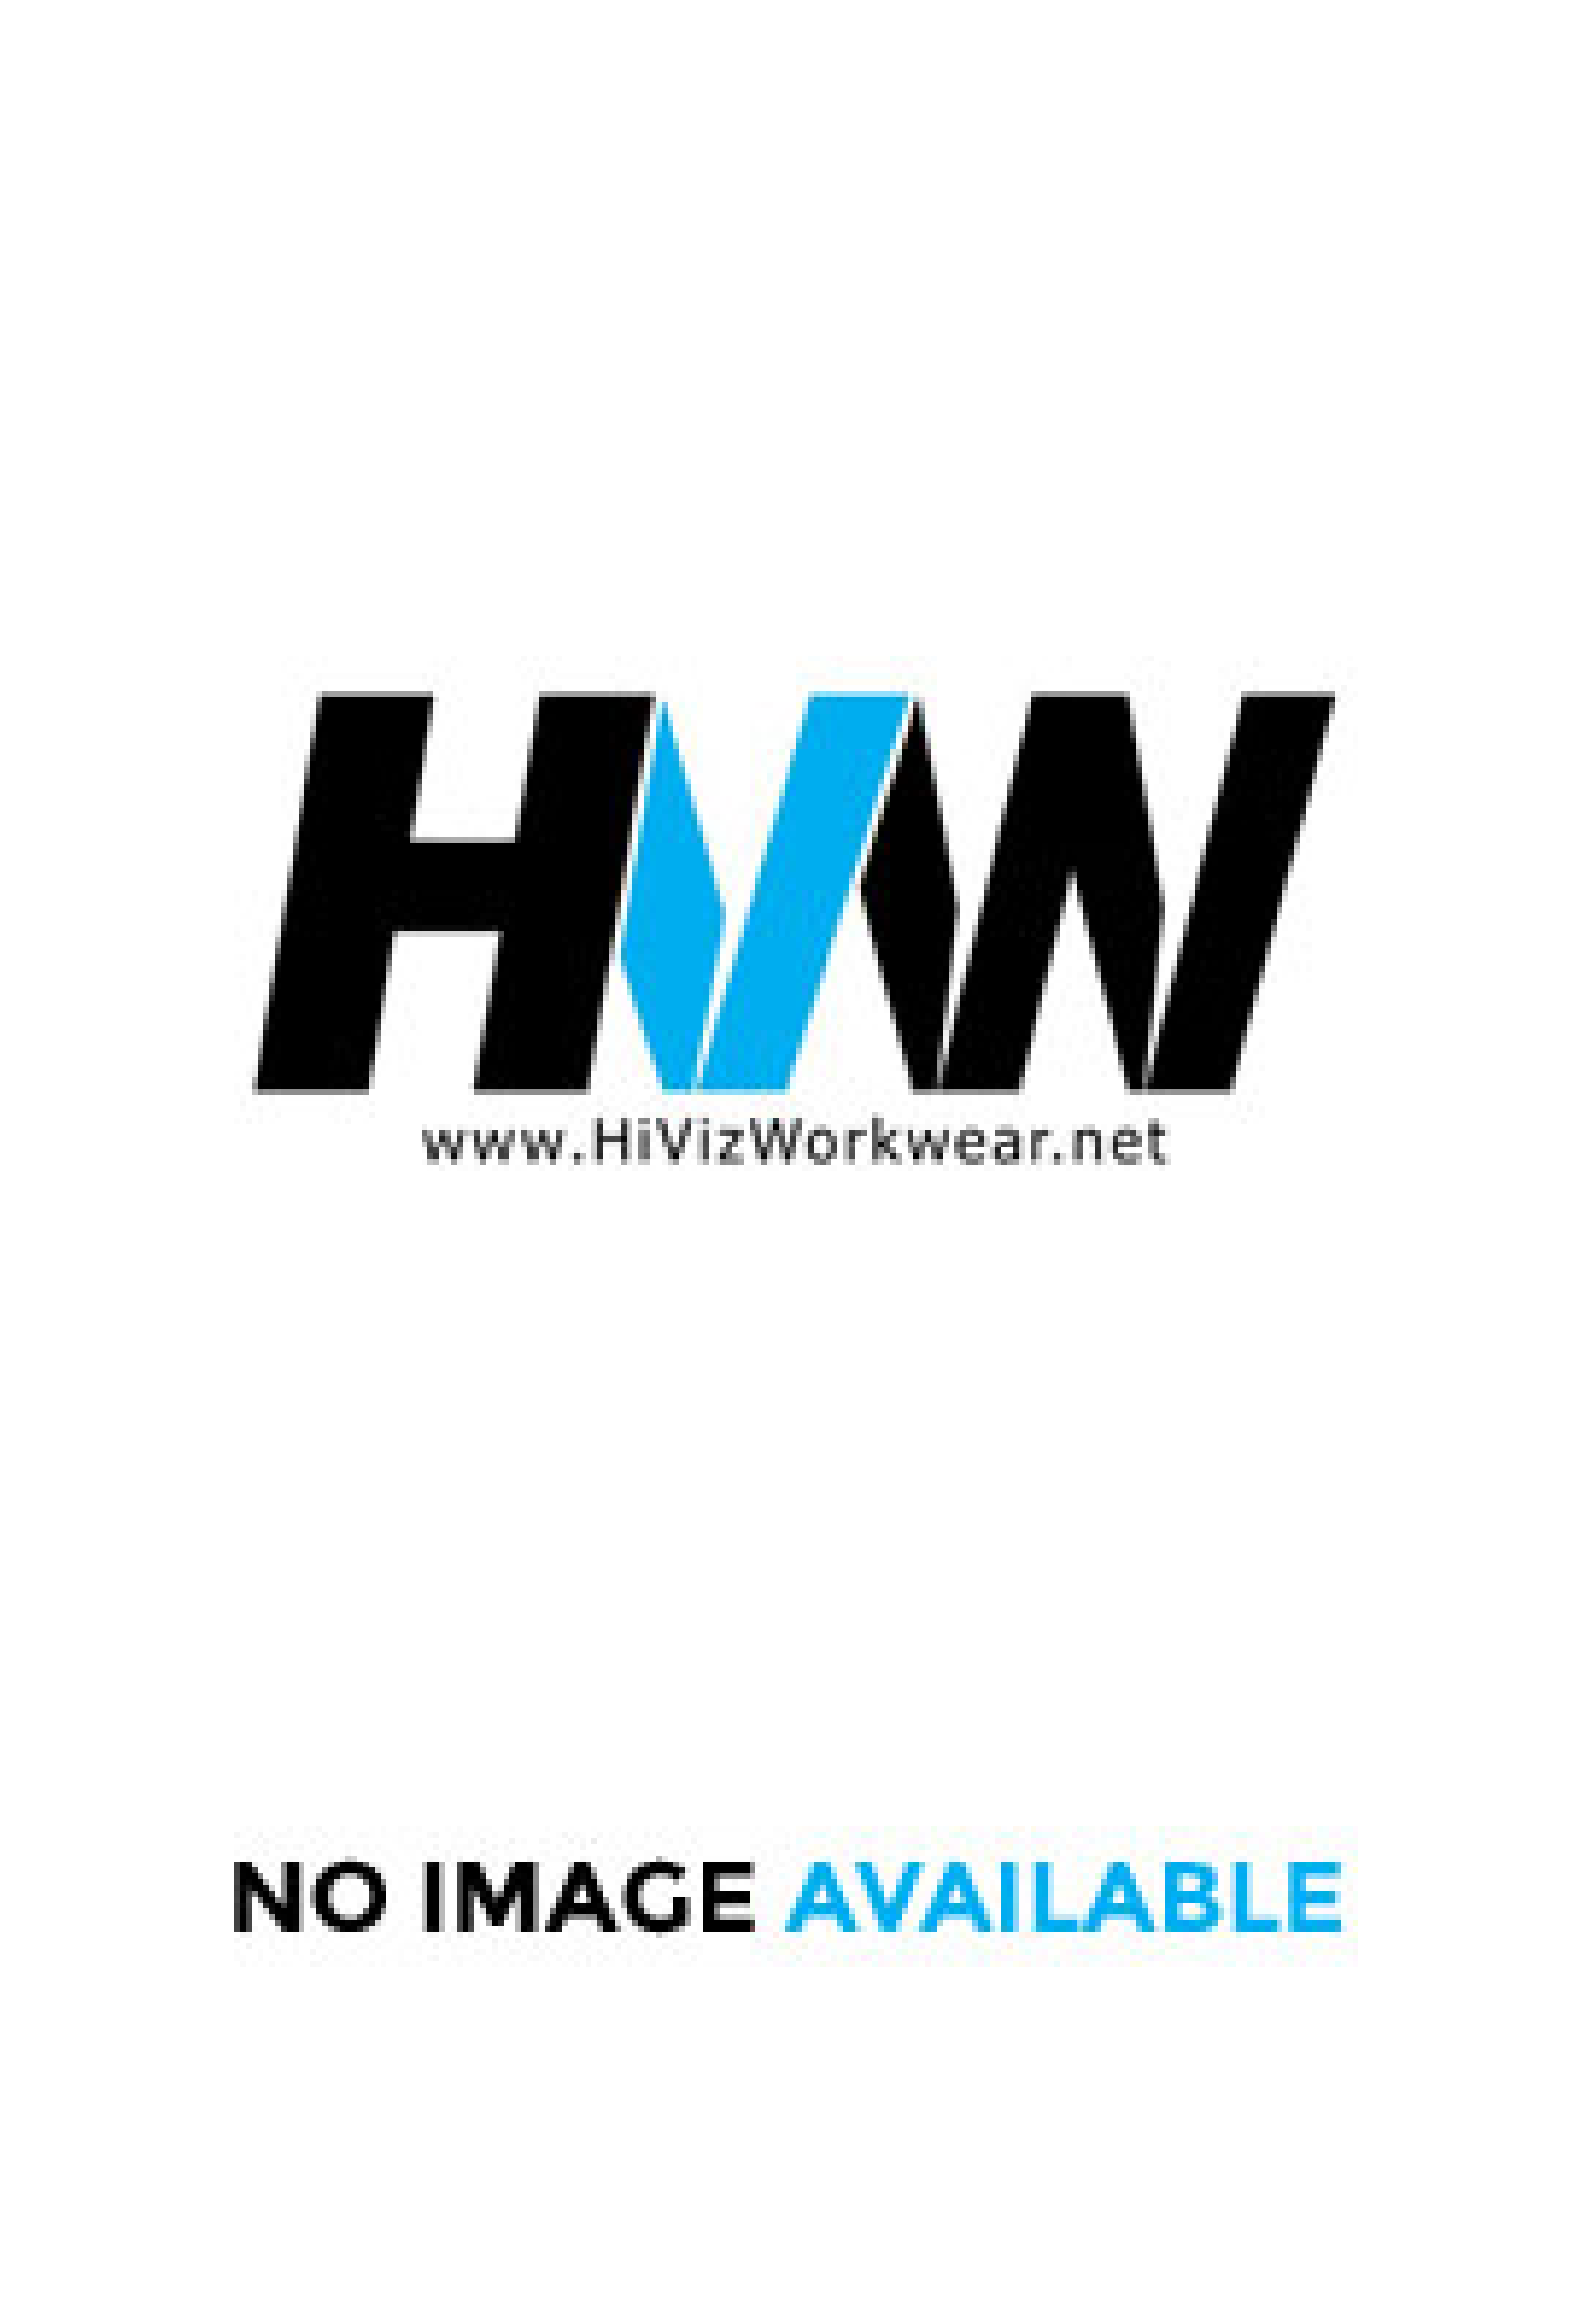 Kustom Kit KK350 WorkWear Oxford Short Sleeved Shirt (Collar Size 14.5 To 18.5)